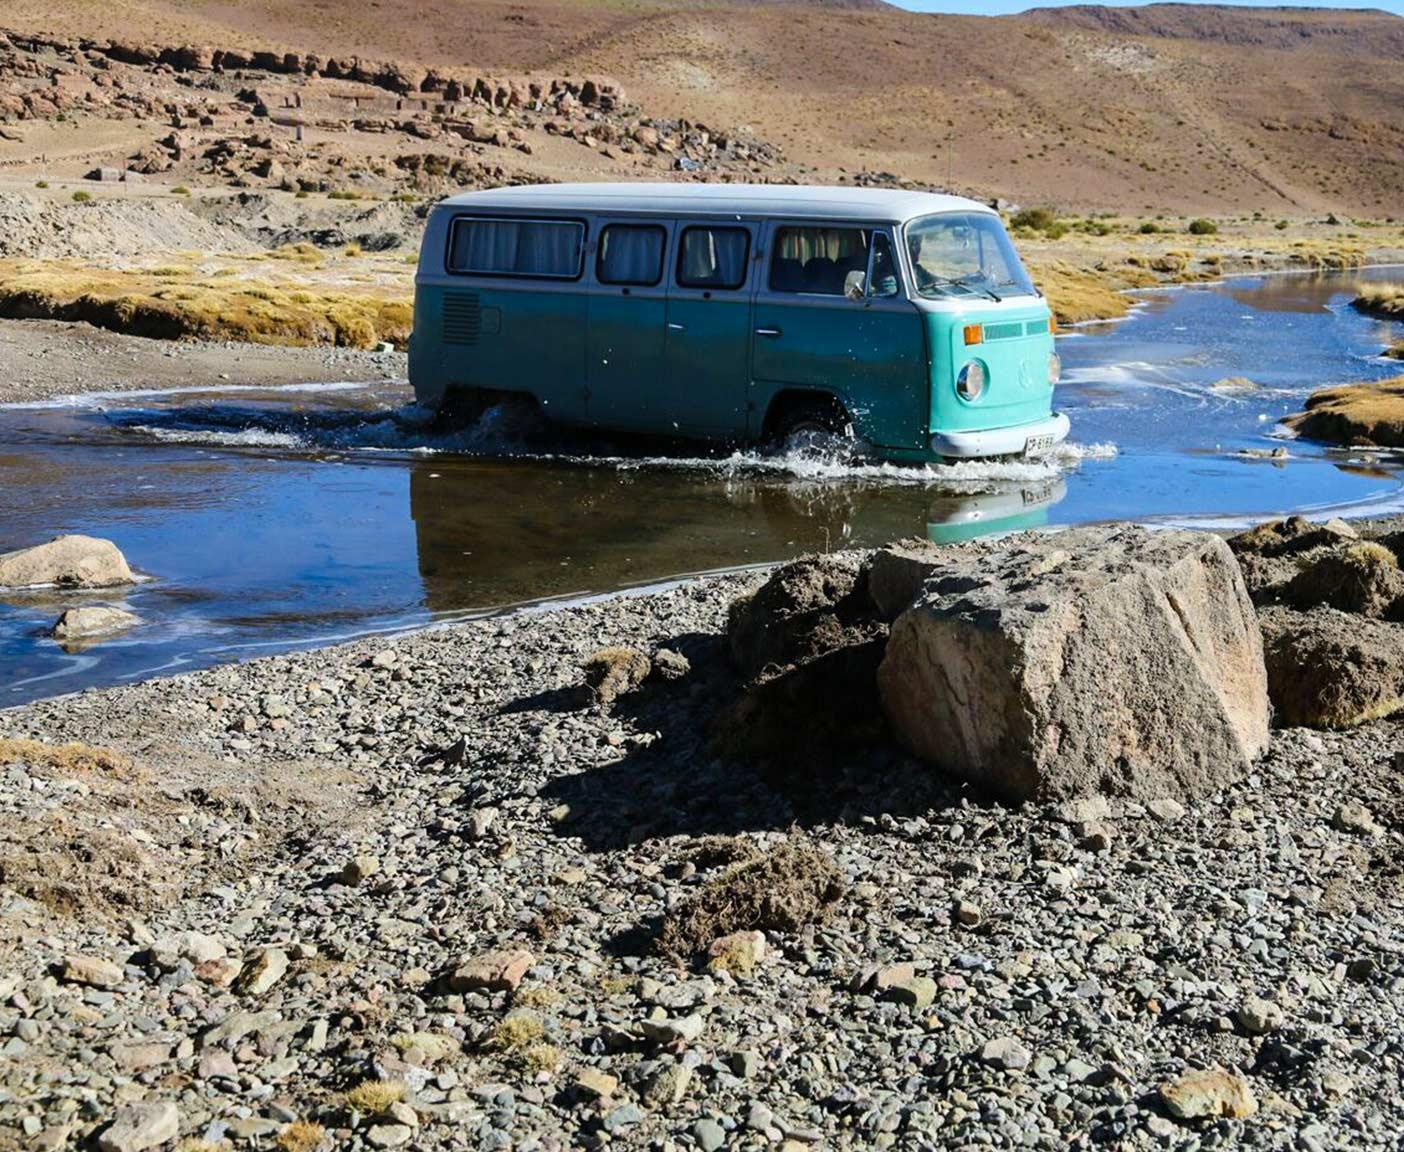 vw-t2-bus-bulli-kaufen-volkswagen-transporter-oldtimer-bully-camper-westfalia-van-i-come-around-doka-gebraucht-samba-14